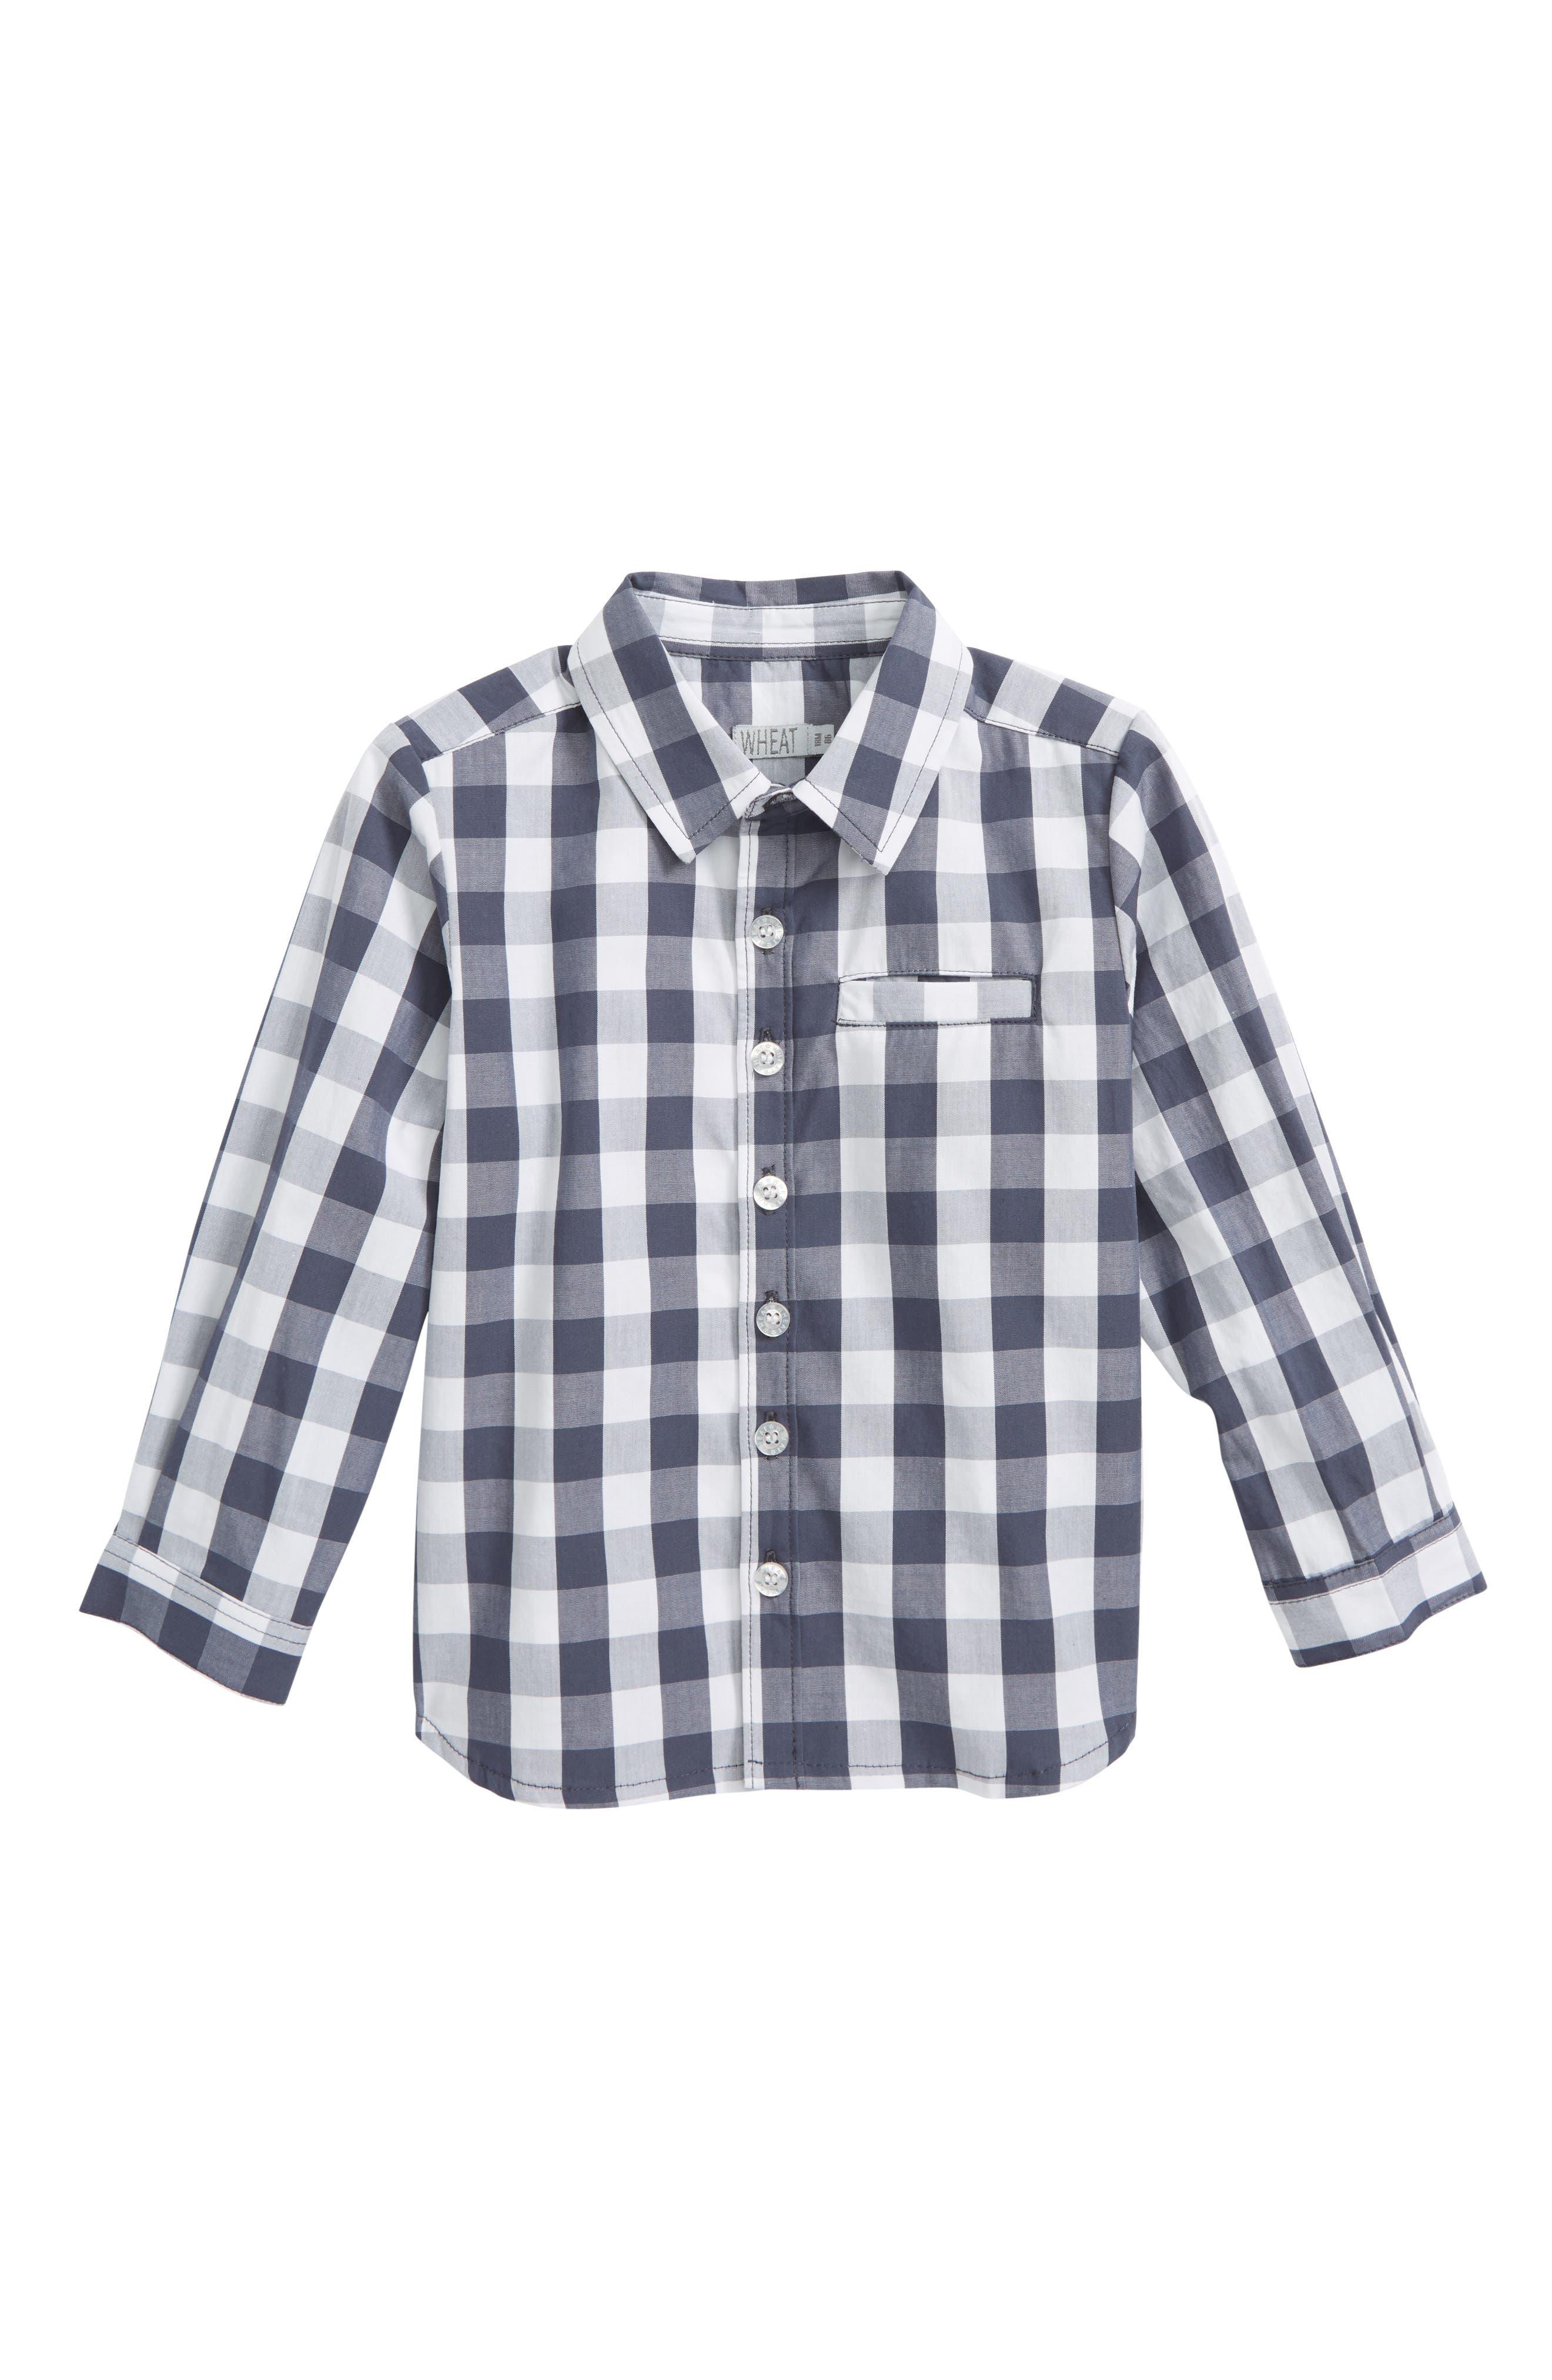 Main Image - Wheat Ellias Check Shirt (Baby Boys & Toddler Boys)